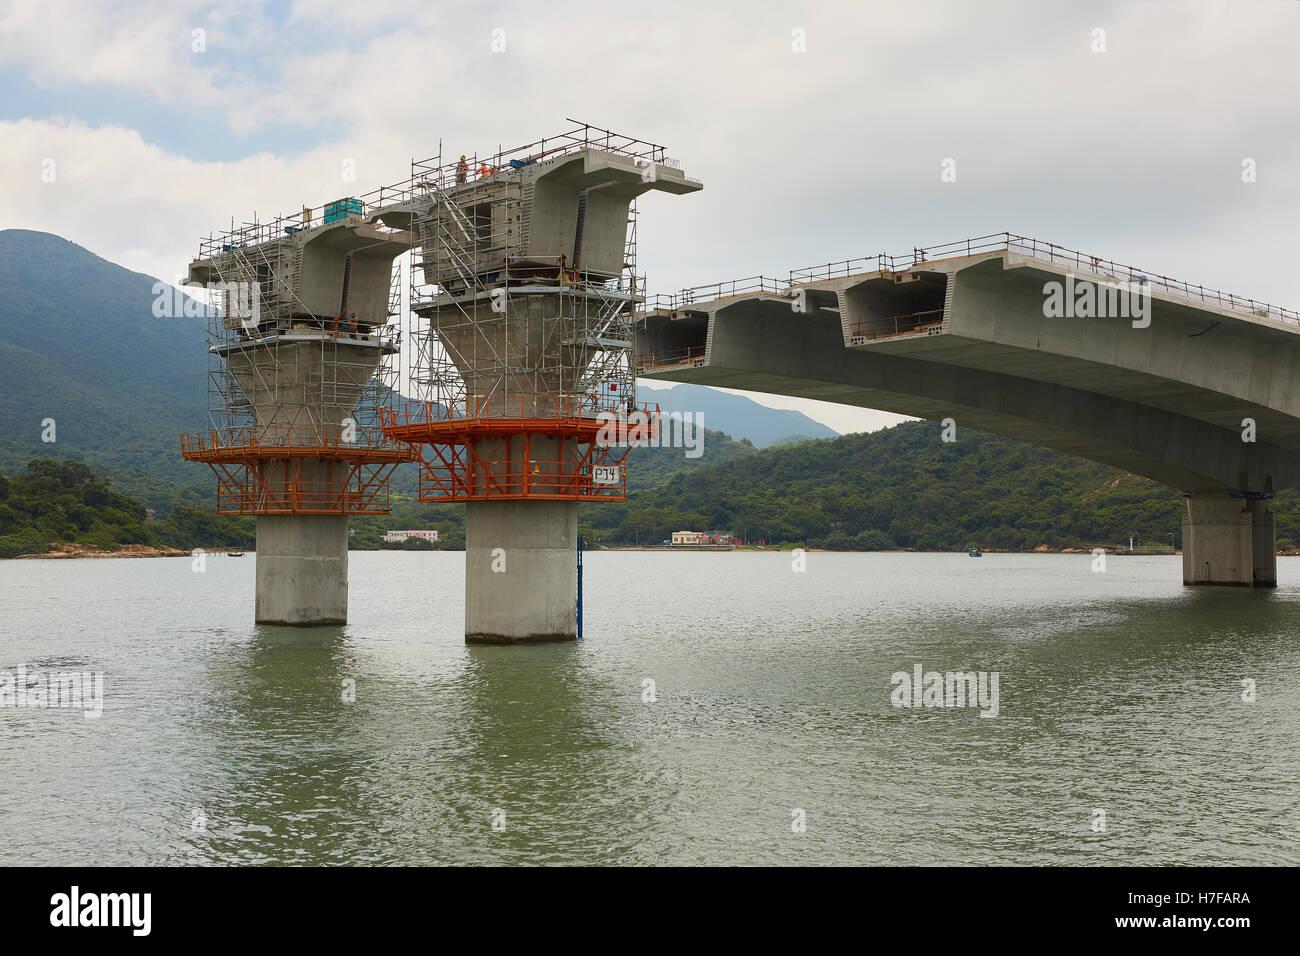 The Hong Kong-Zhuhai-Macau Bridge Construction North of Lantau Island, Hong Kong. - Stock Image